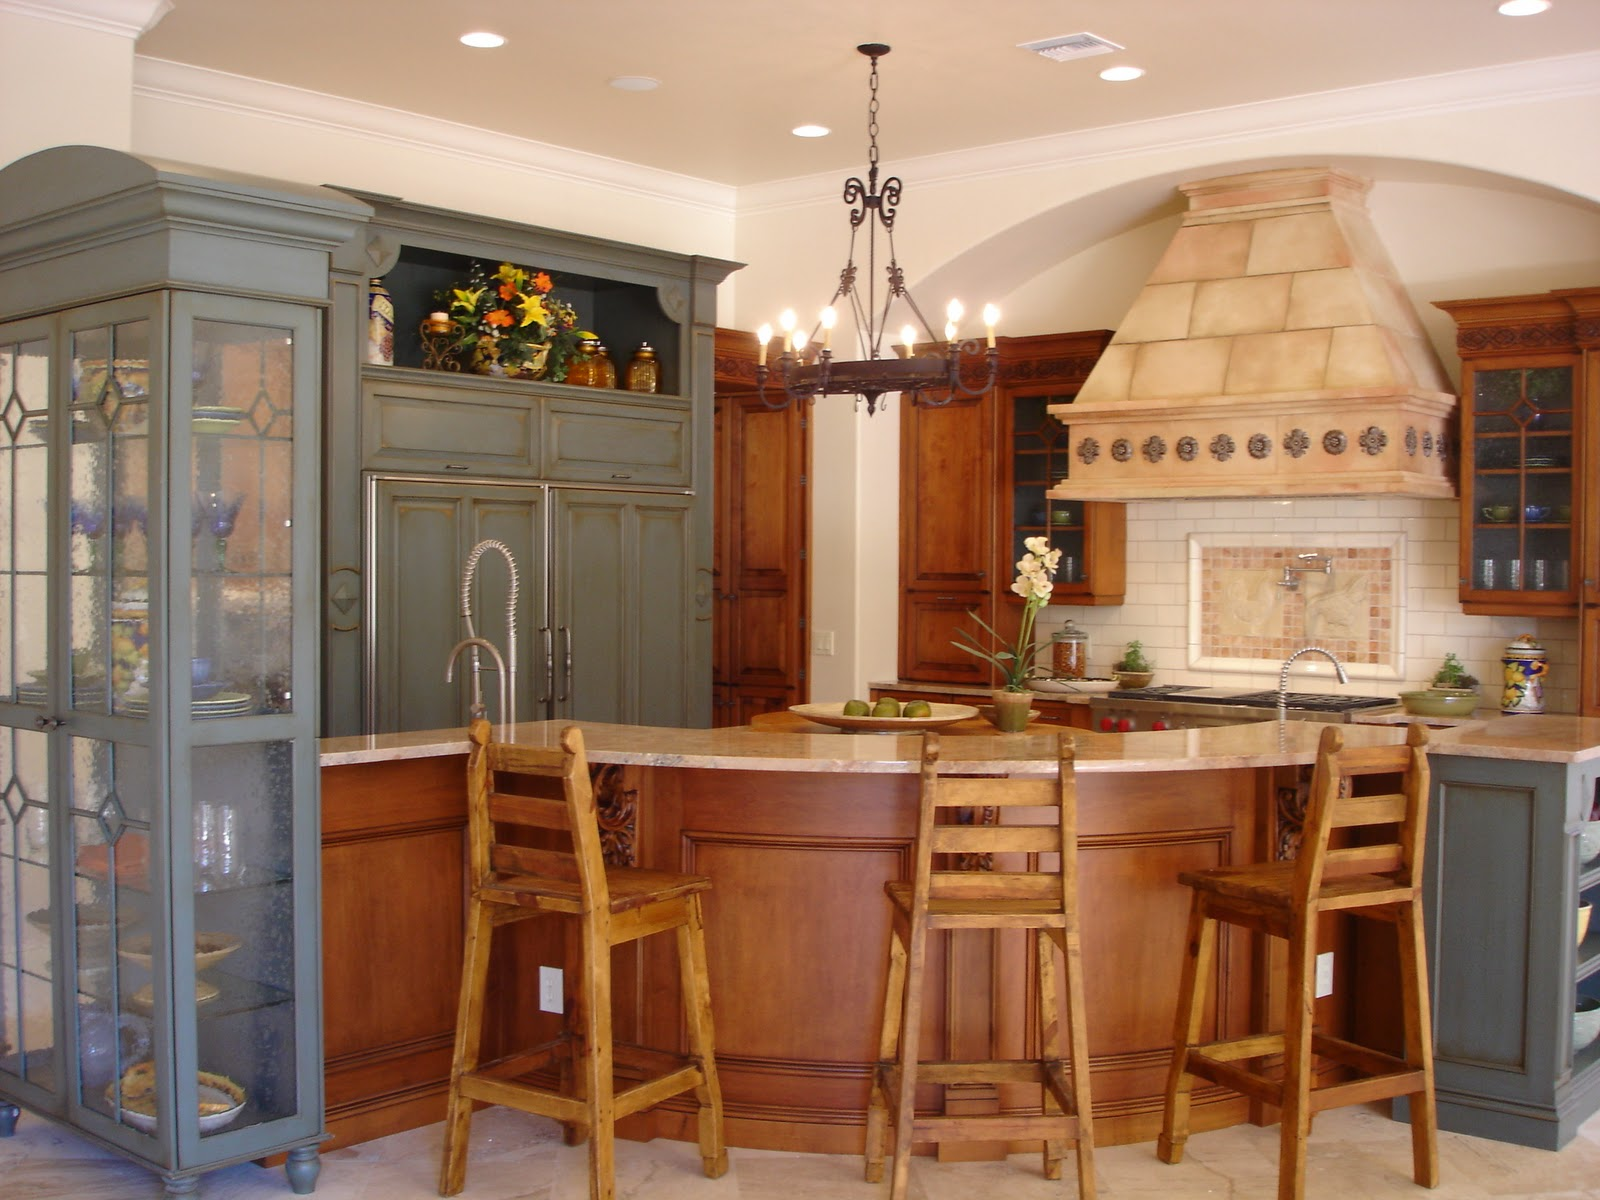 Key Interiors by Shinay Tuscan Kitchen Ideas